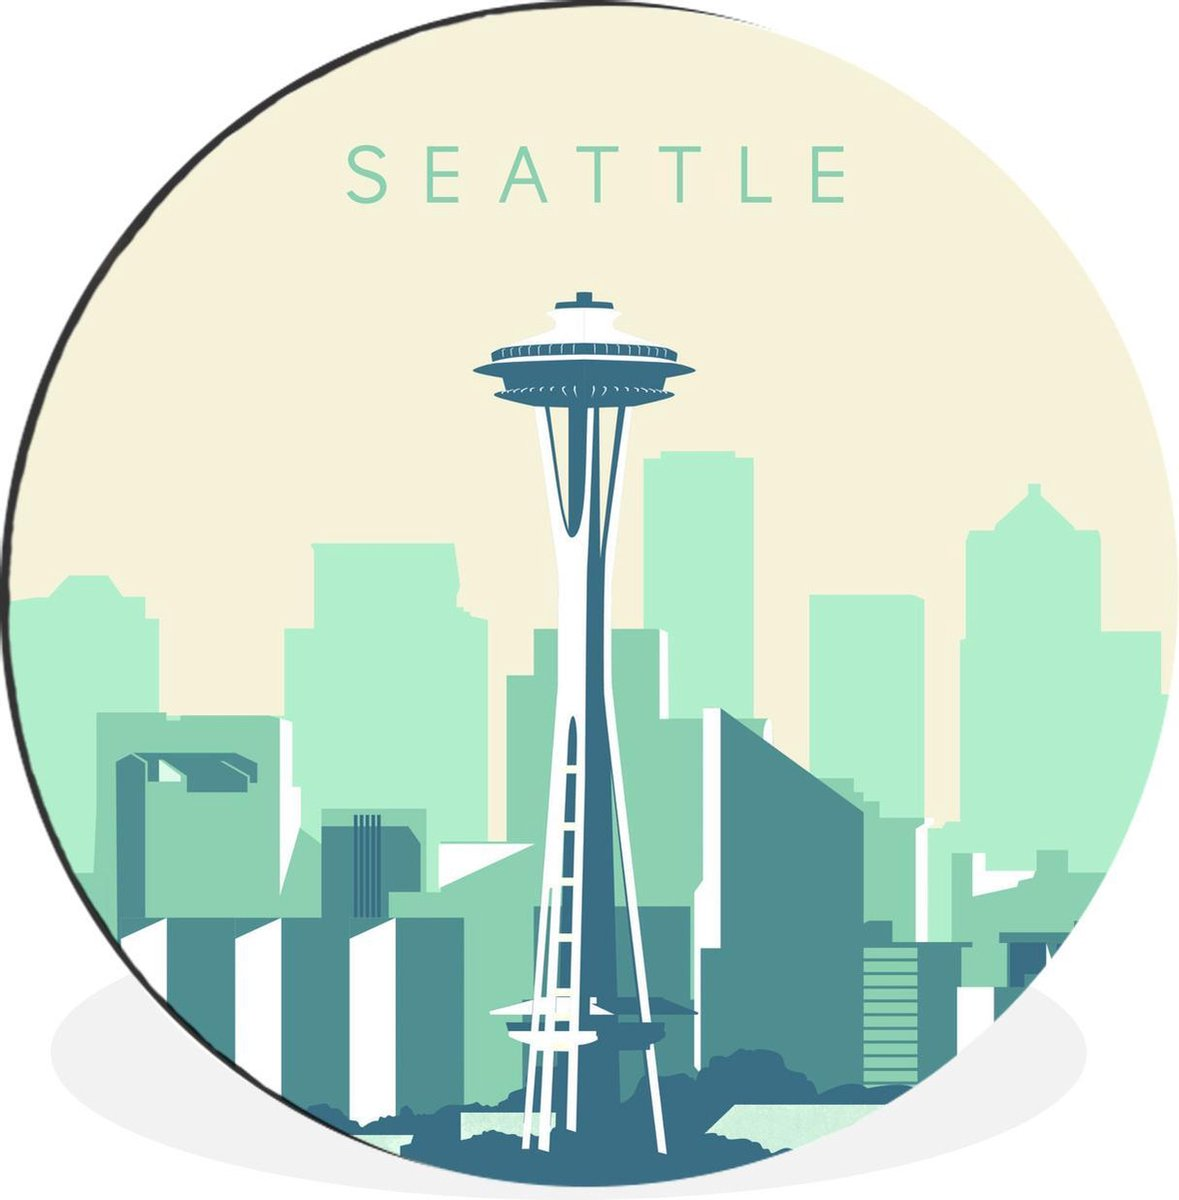 Wandcirkel Amerika Reizen Illustratie aluminium - Seattle illustratie, Washington State -   120 cm - rond schilderij - fotoprint op aluminium / dibond / muurcirkel / wooncirkel / tuincirkel (wanddecoratie) XXL /